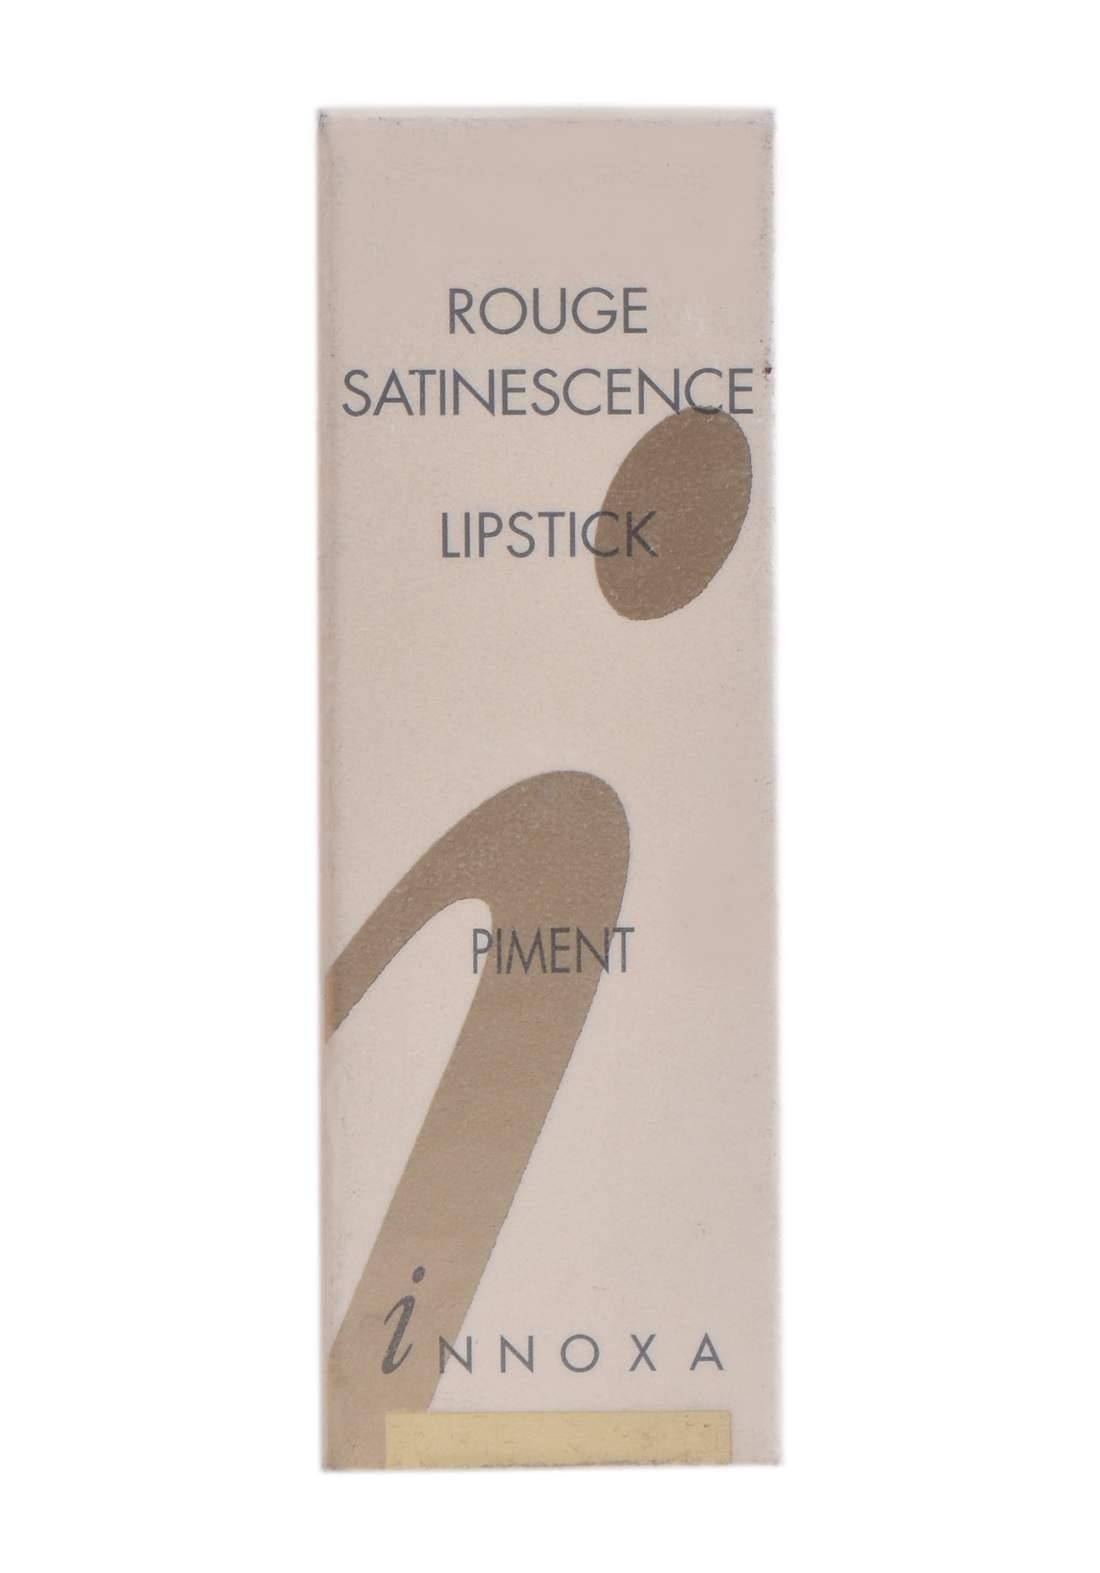 Innoxa Lipstick Rouge Pouge Clarescence -Piment  احمر شفاه